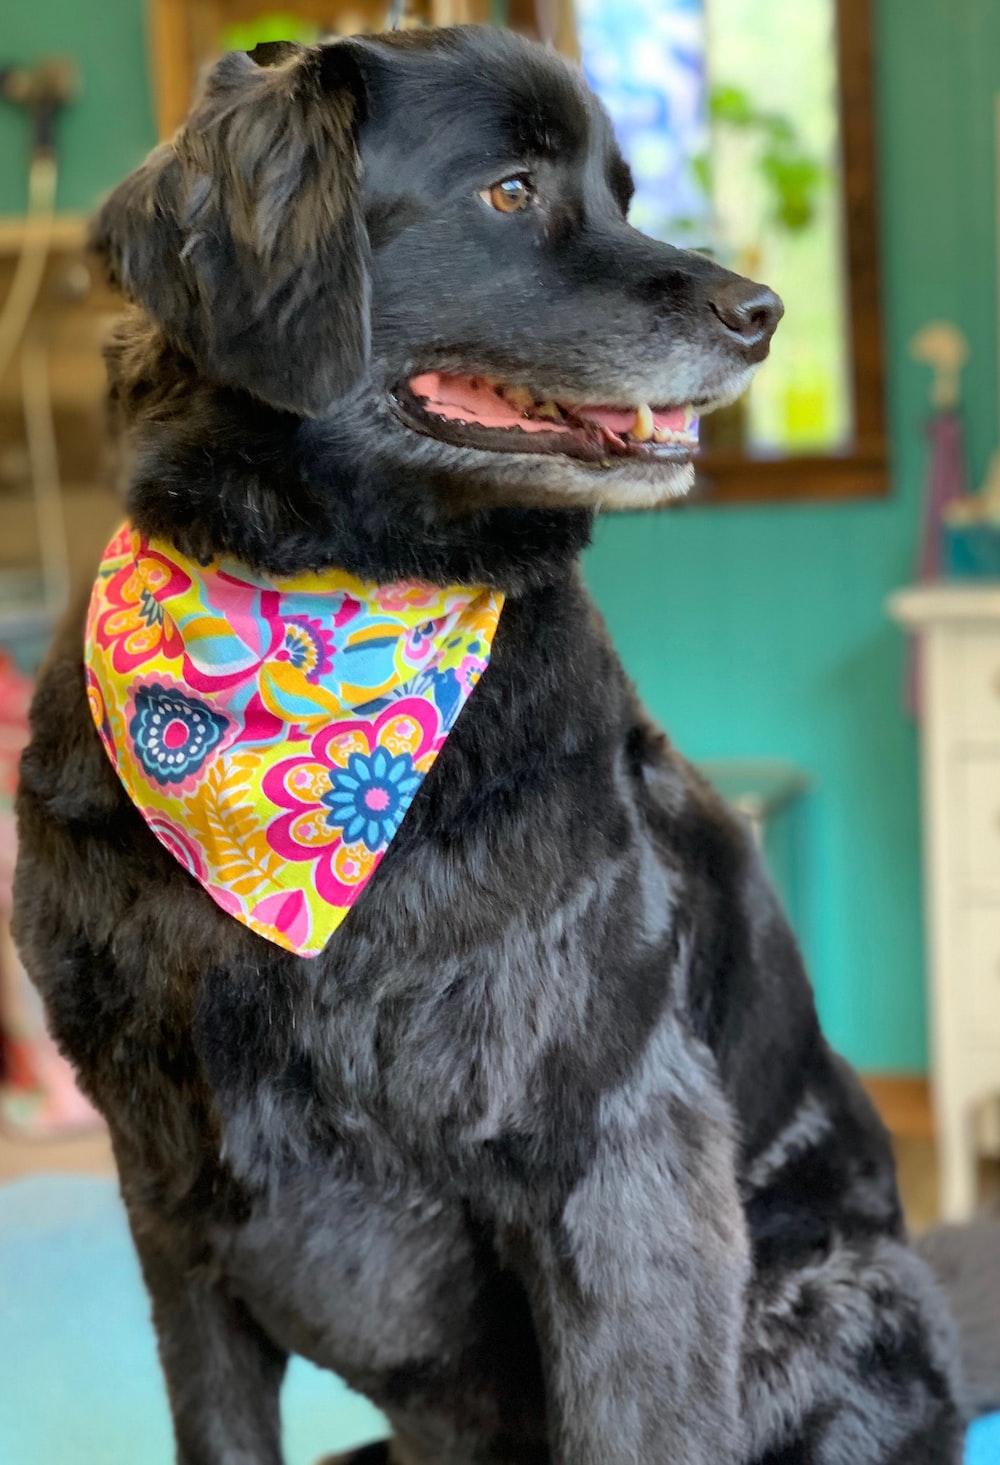 black short coated large dog wearing orange and white floral scarf